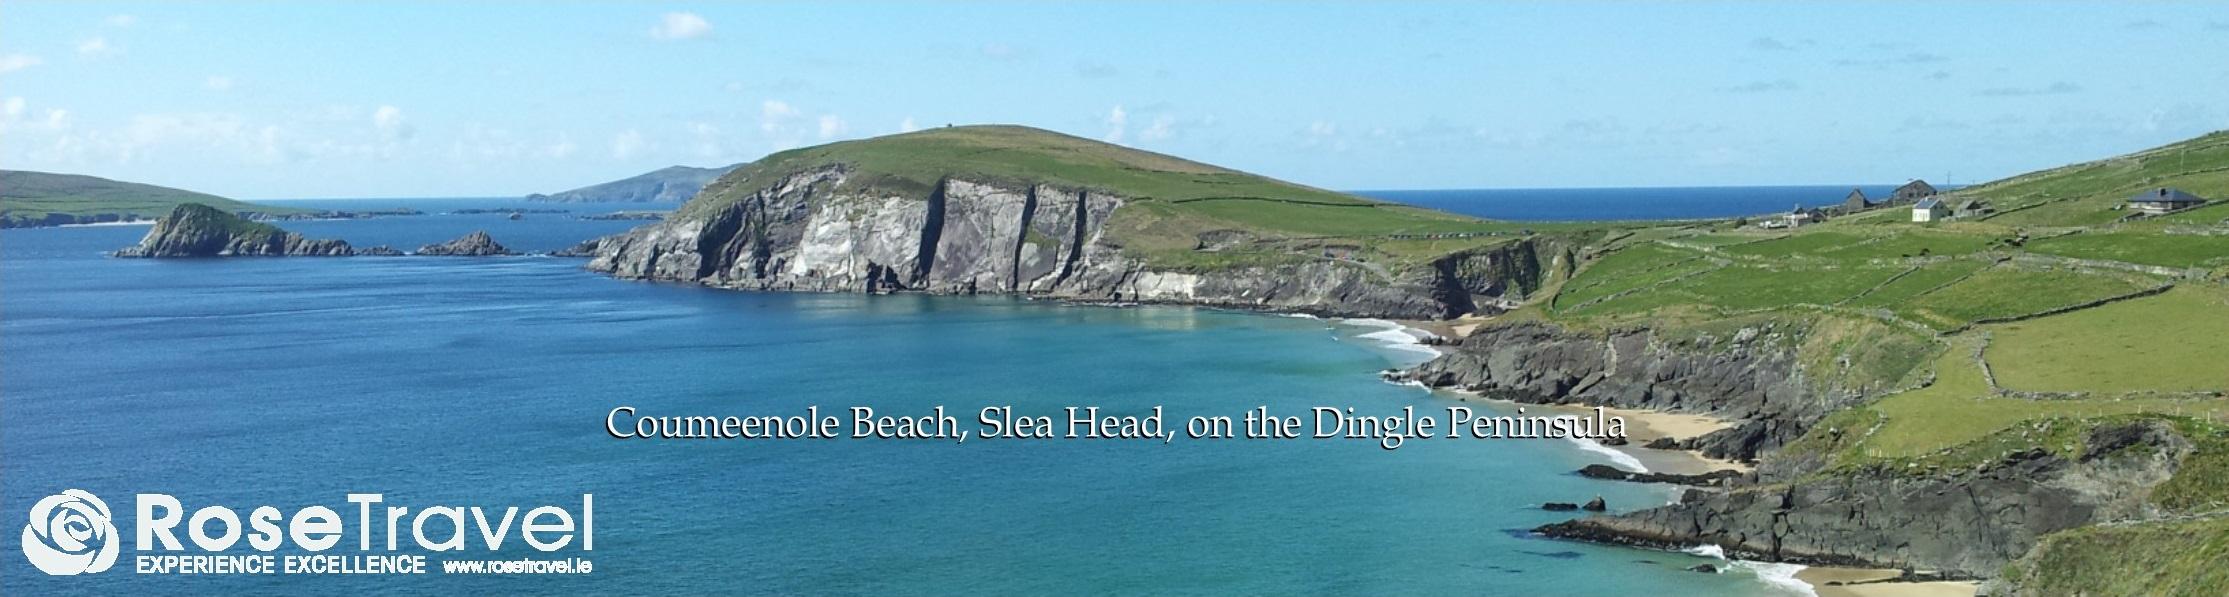 Coumeenole Beach, Slea Head, on the Dingle Peninsula